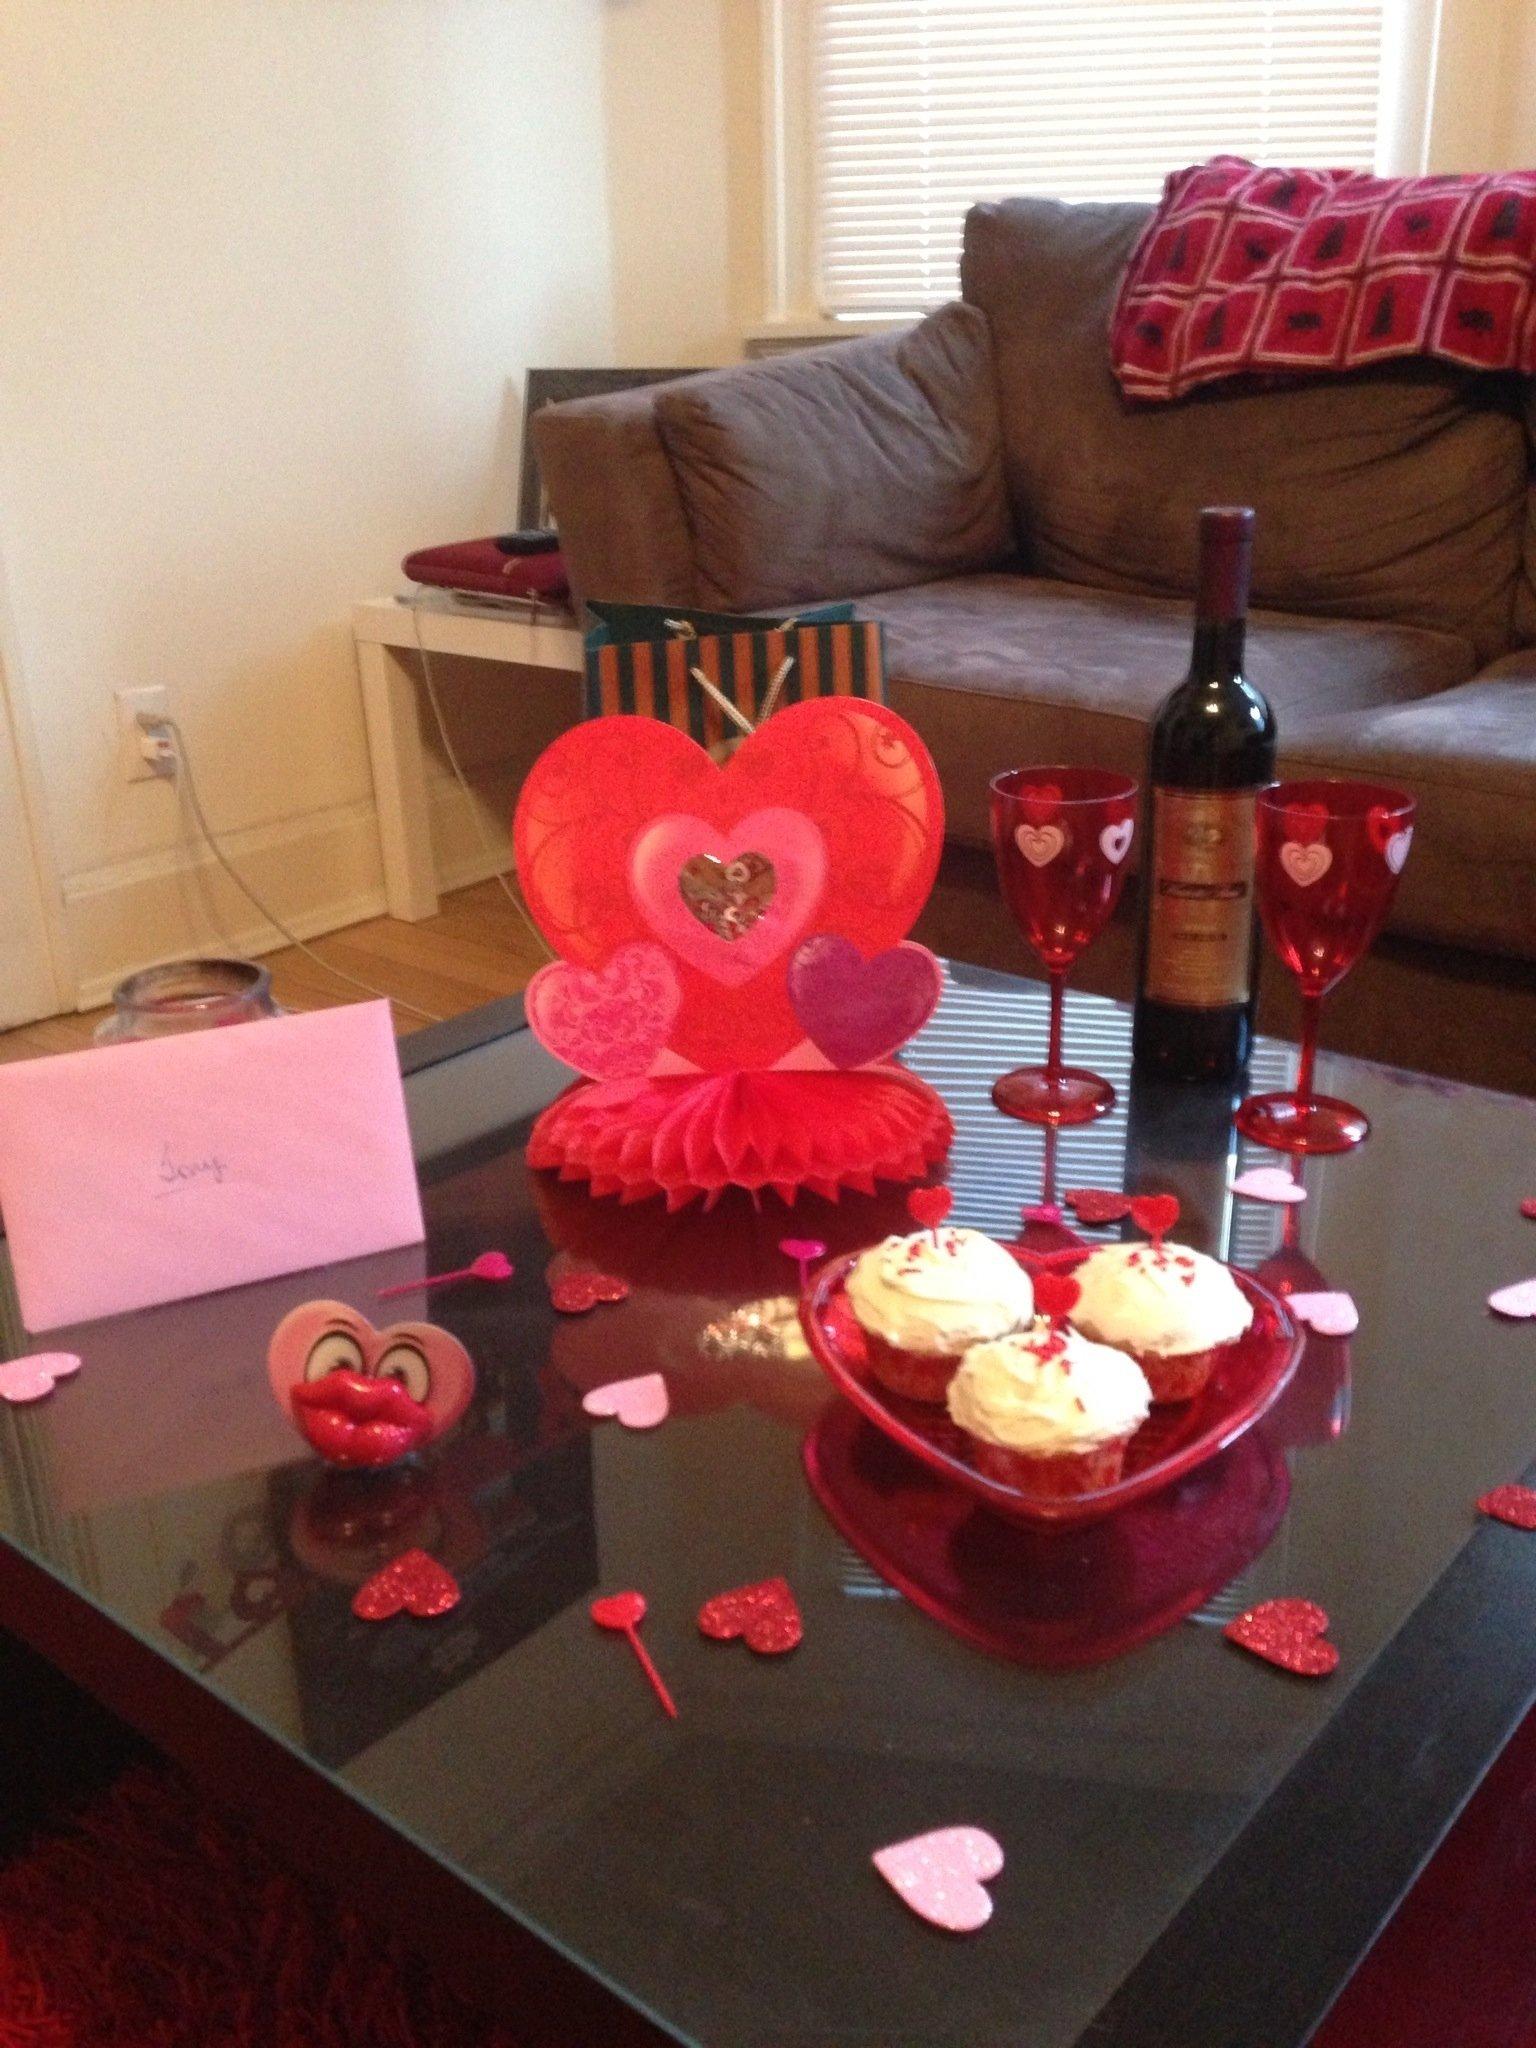 10 Unique Romantic Bedroom Ideas For Valentines Day valentines day room decorations dining room decoration for 3 2020